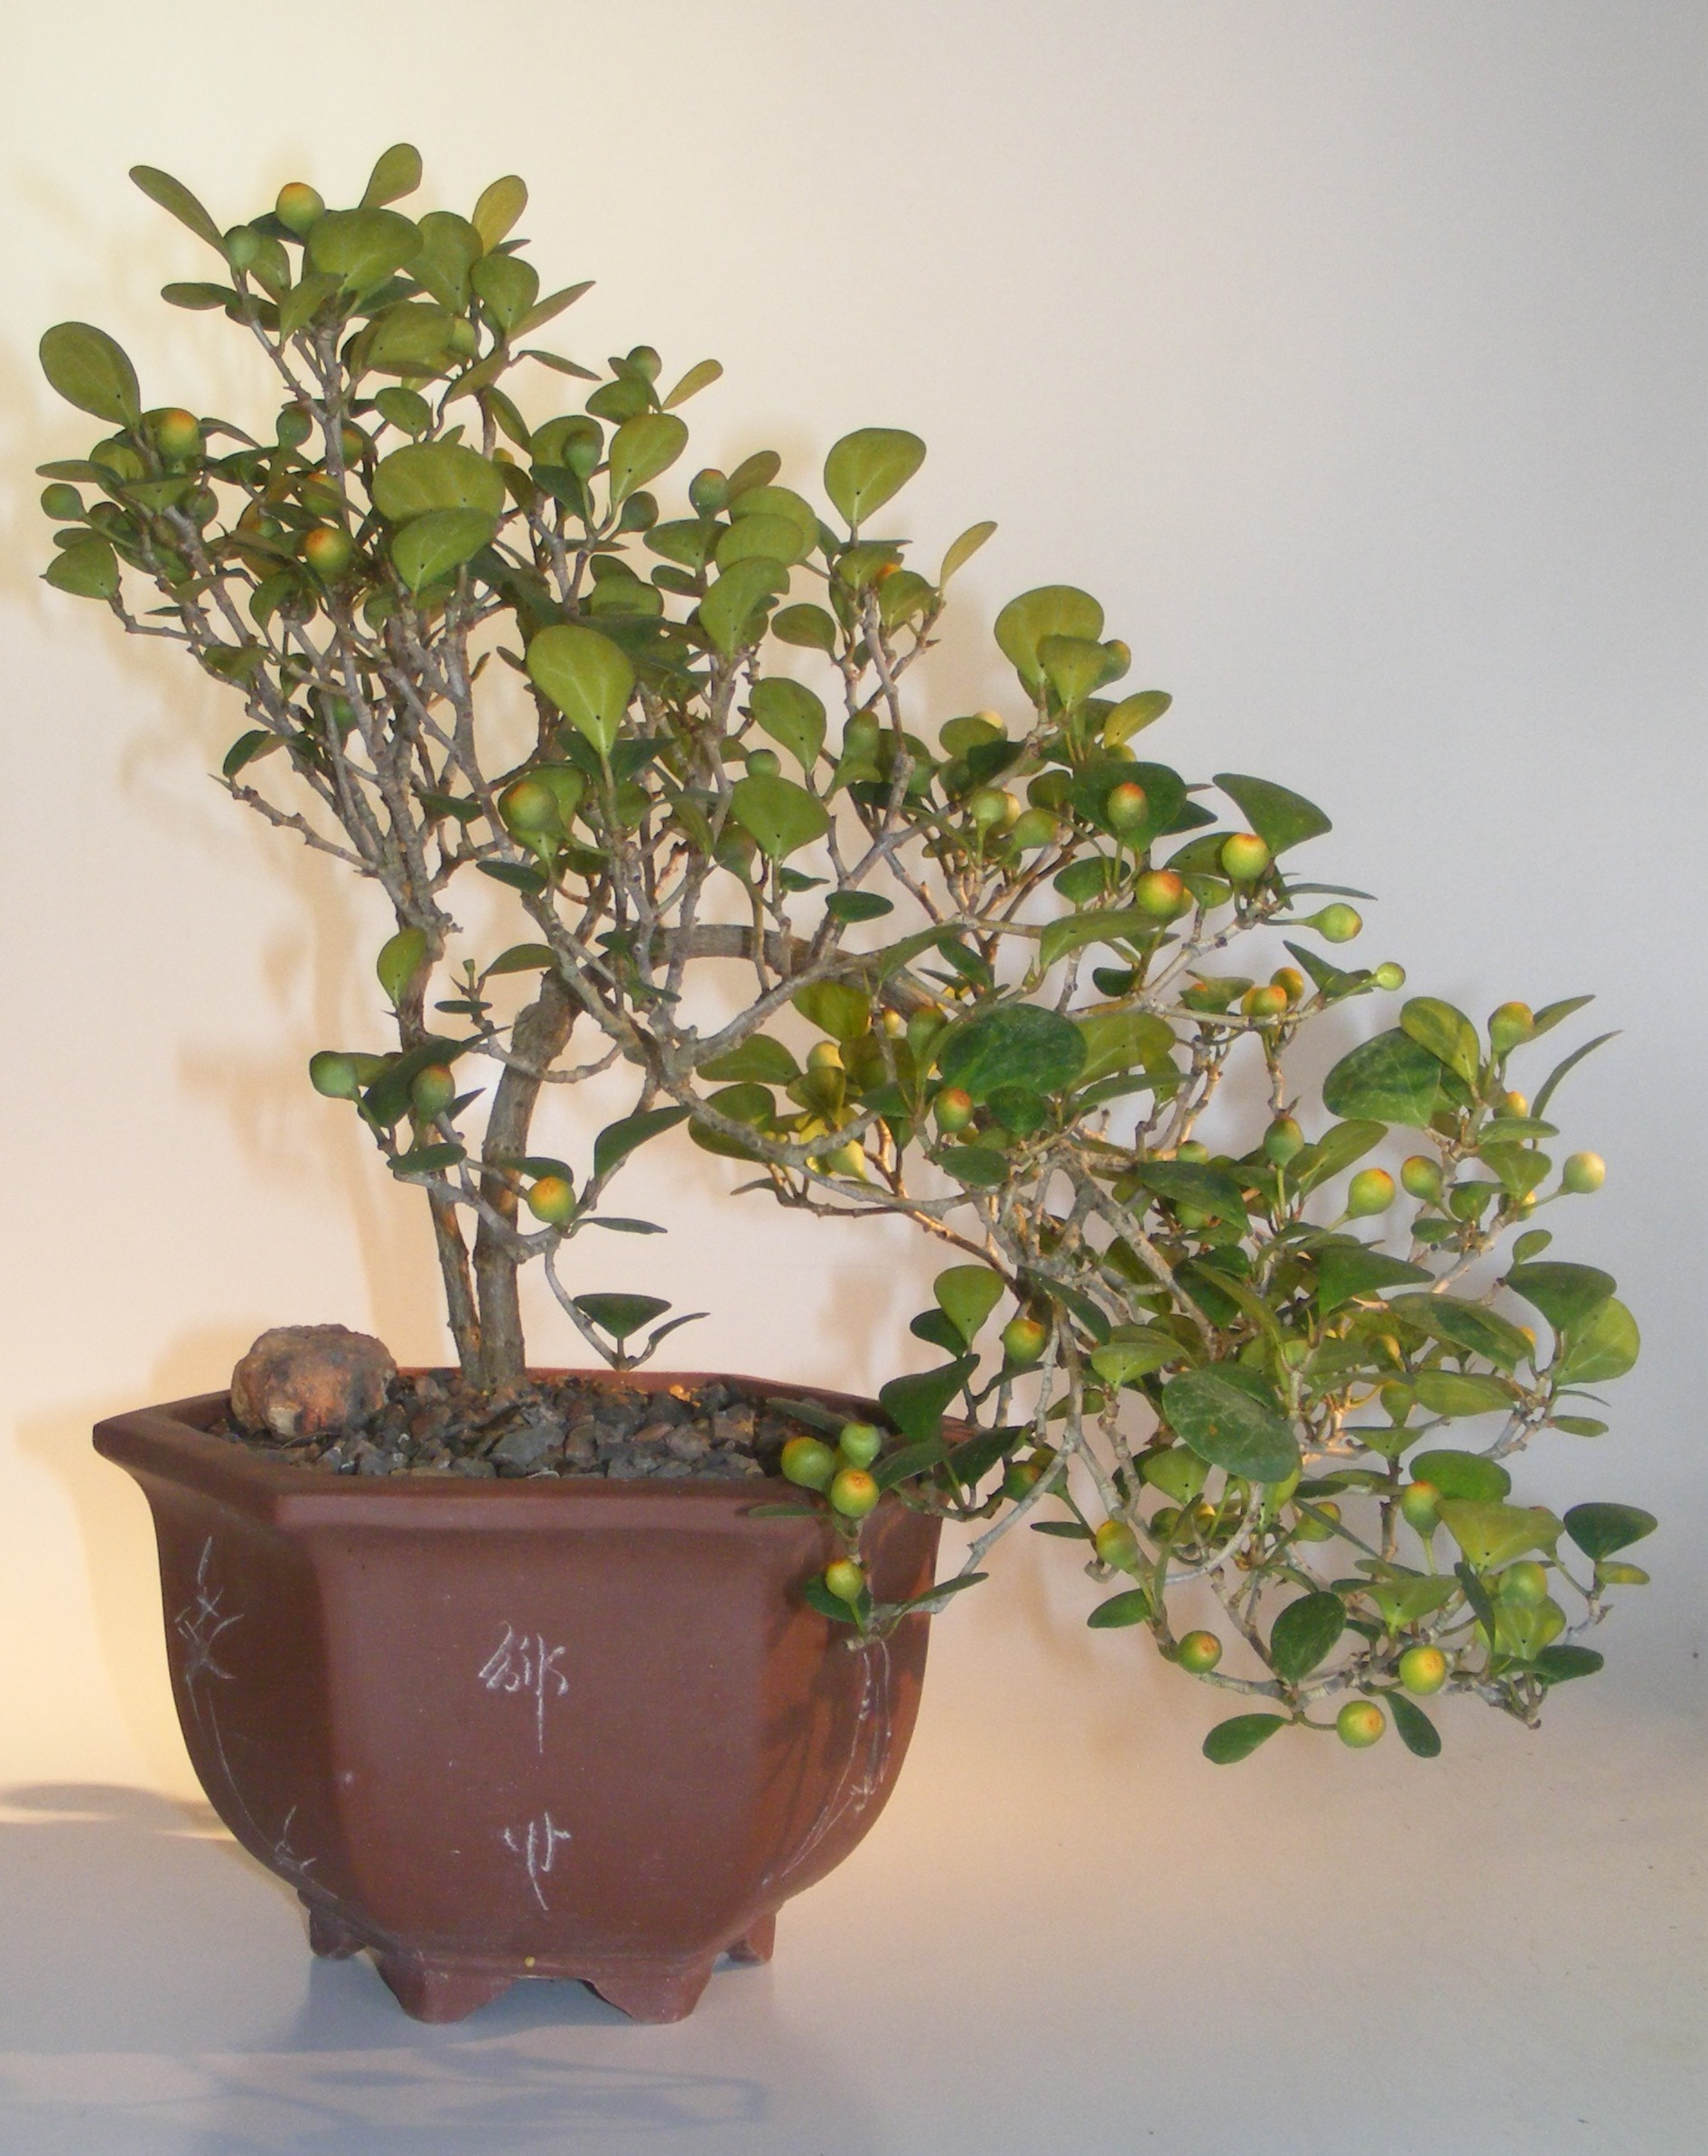 Mistletoe Fig Bonsai TreeCascade Style(ficus diversifolia) Image